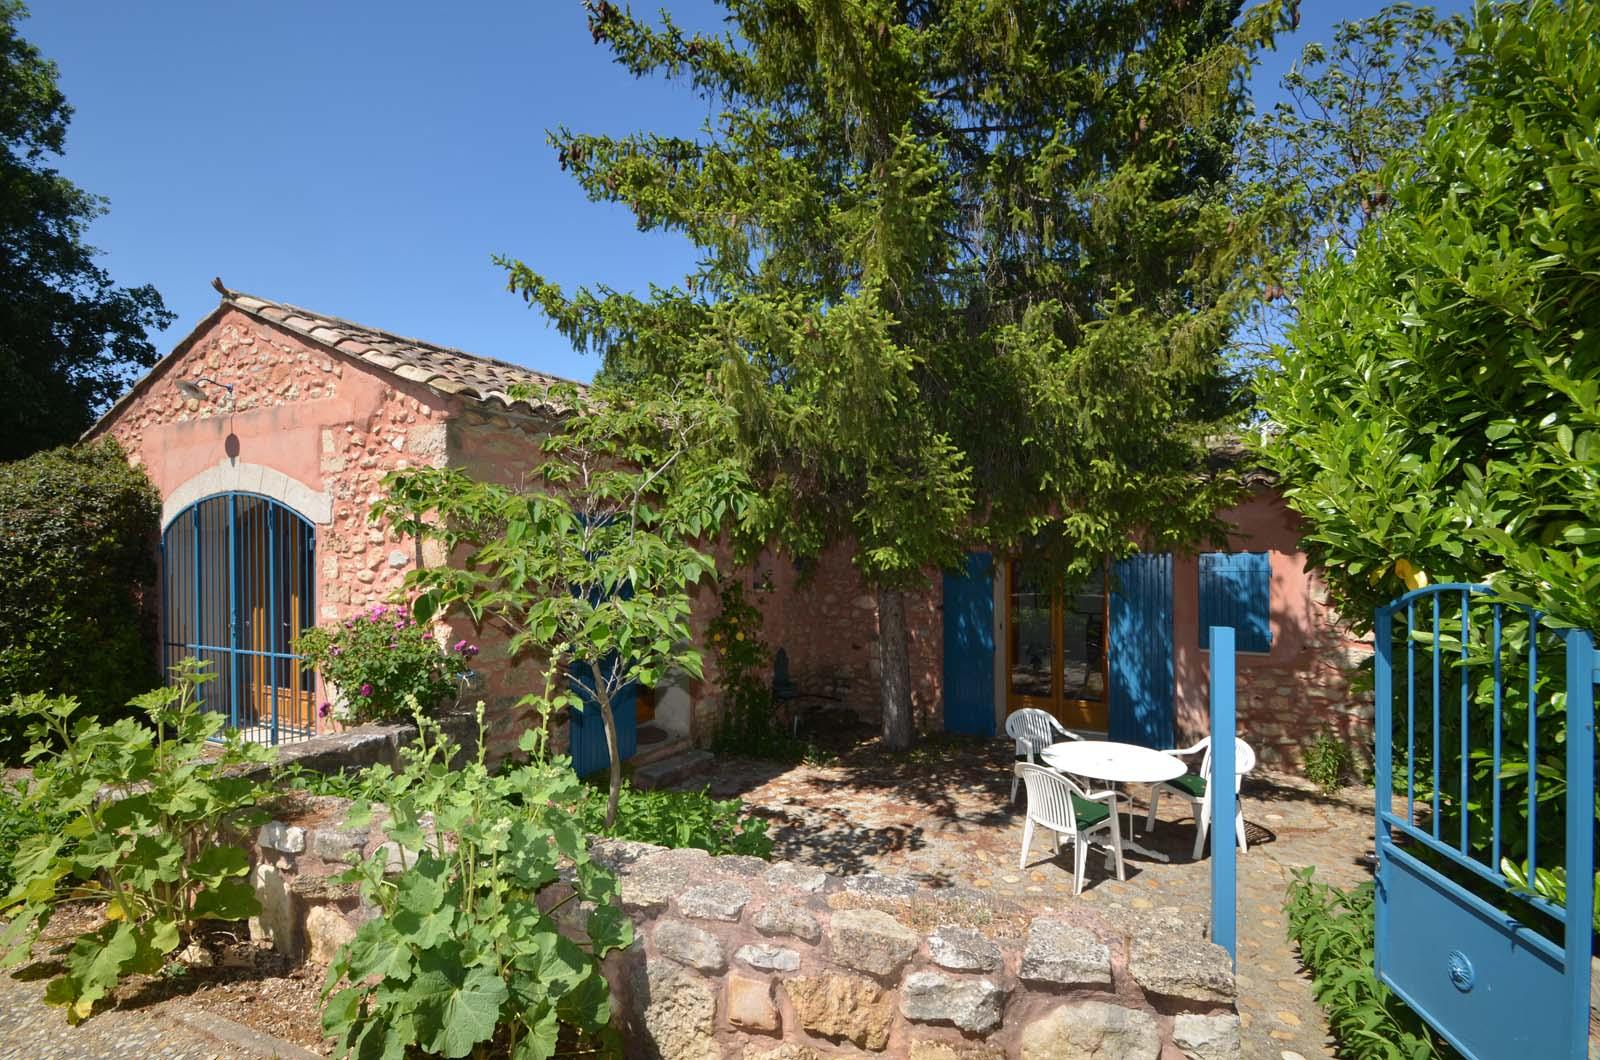 Vakantiehuis in Gargas, in Provence-Cote d'Azur.